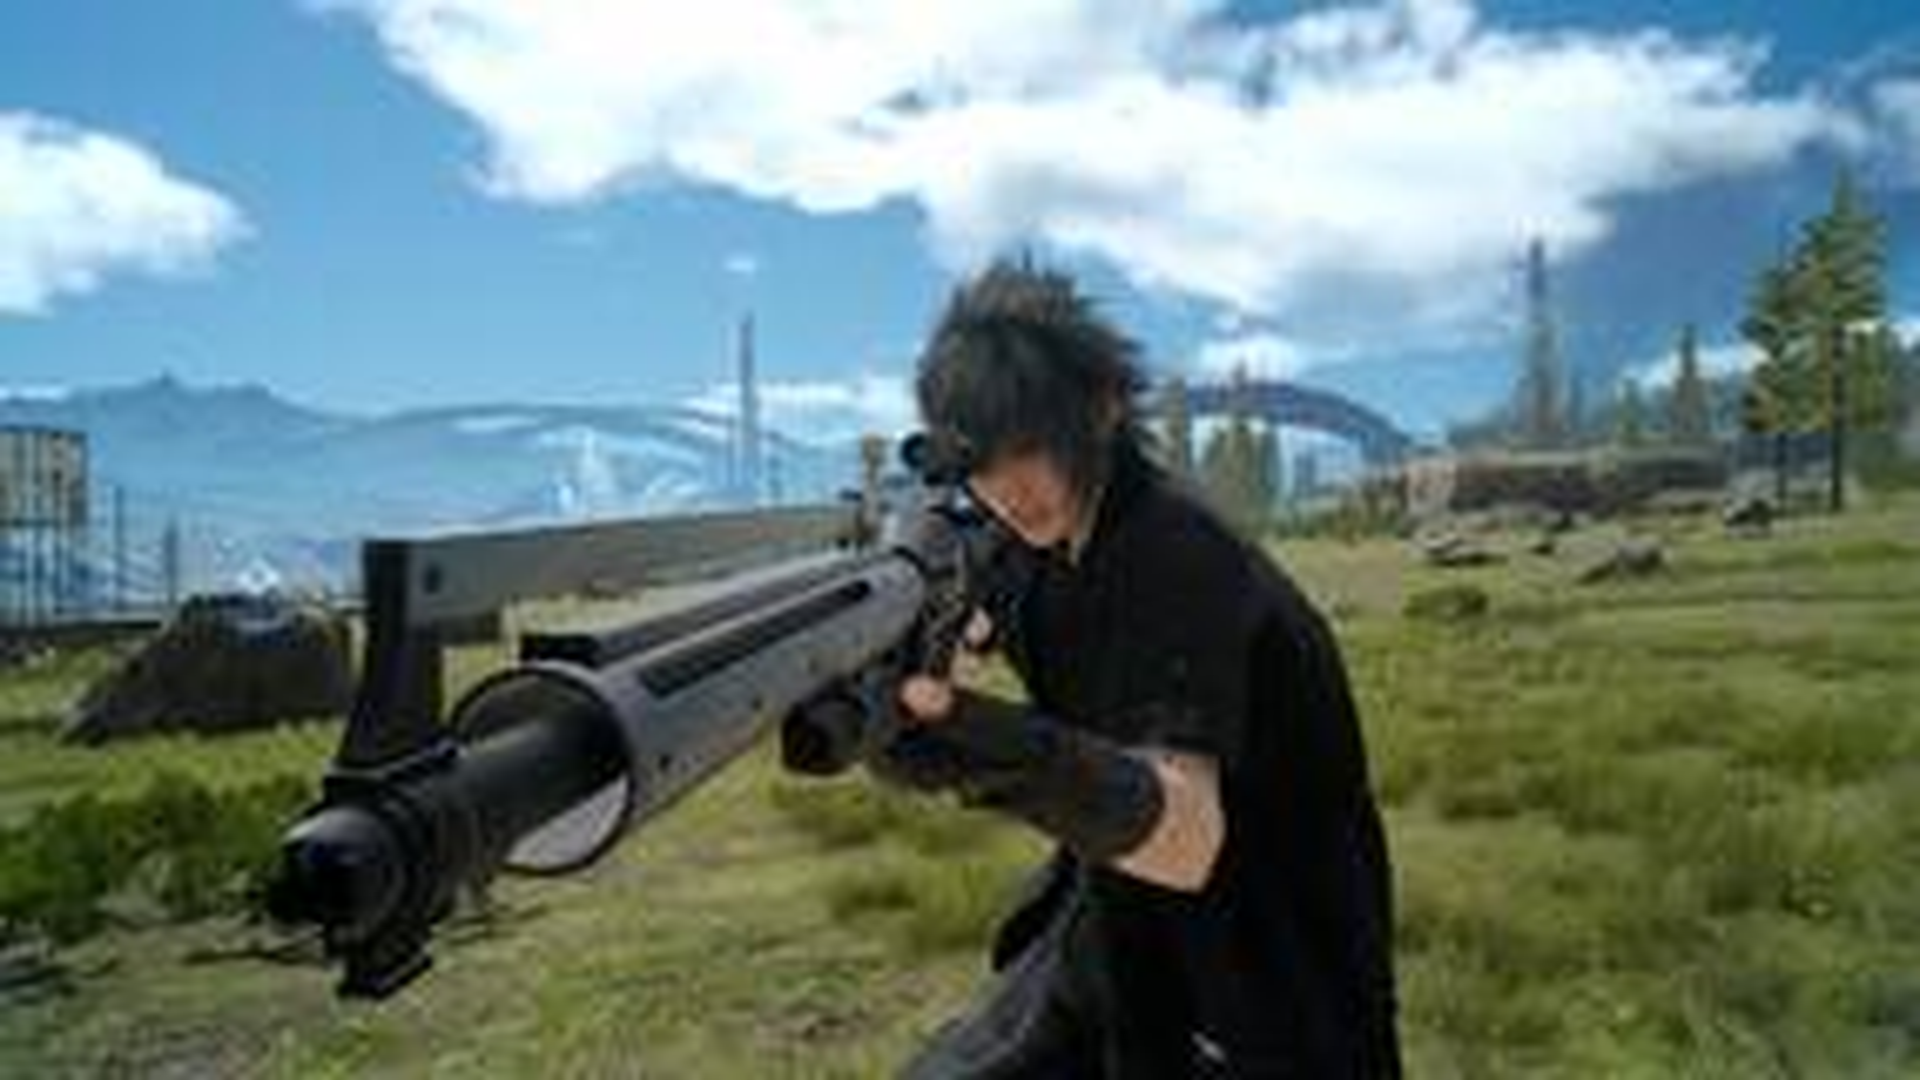 Image for Final Fantasy 15 combat screens show rifle, handgun, circular saw in action